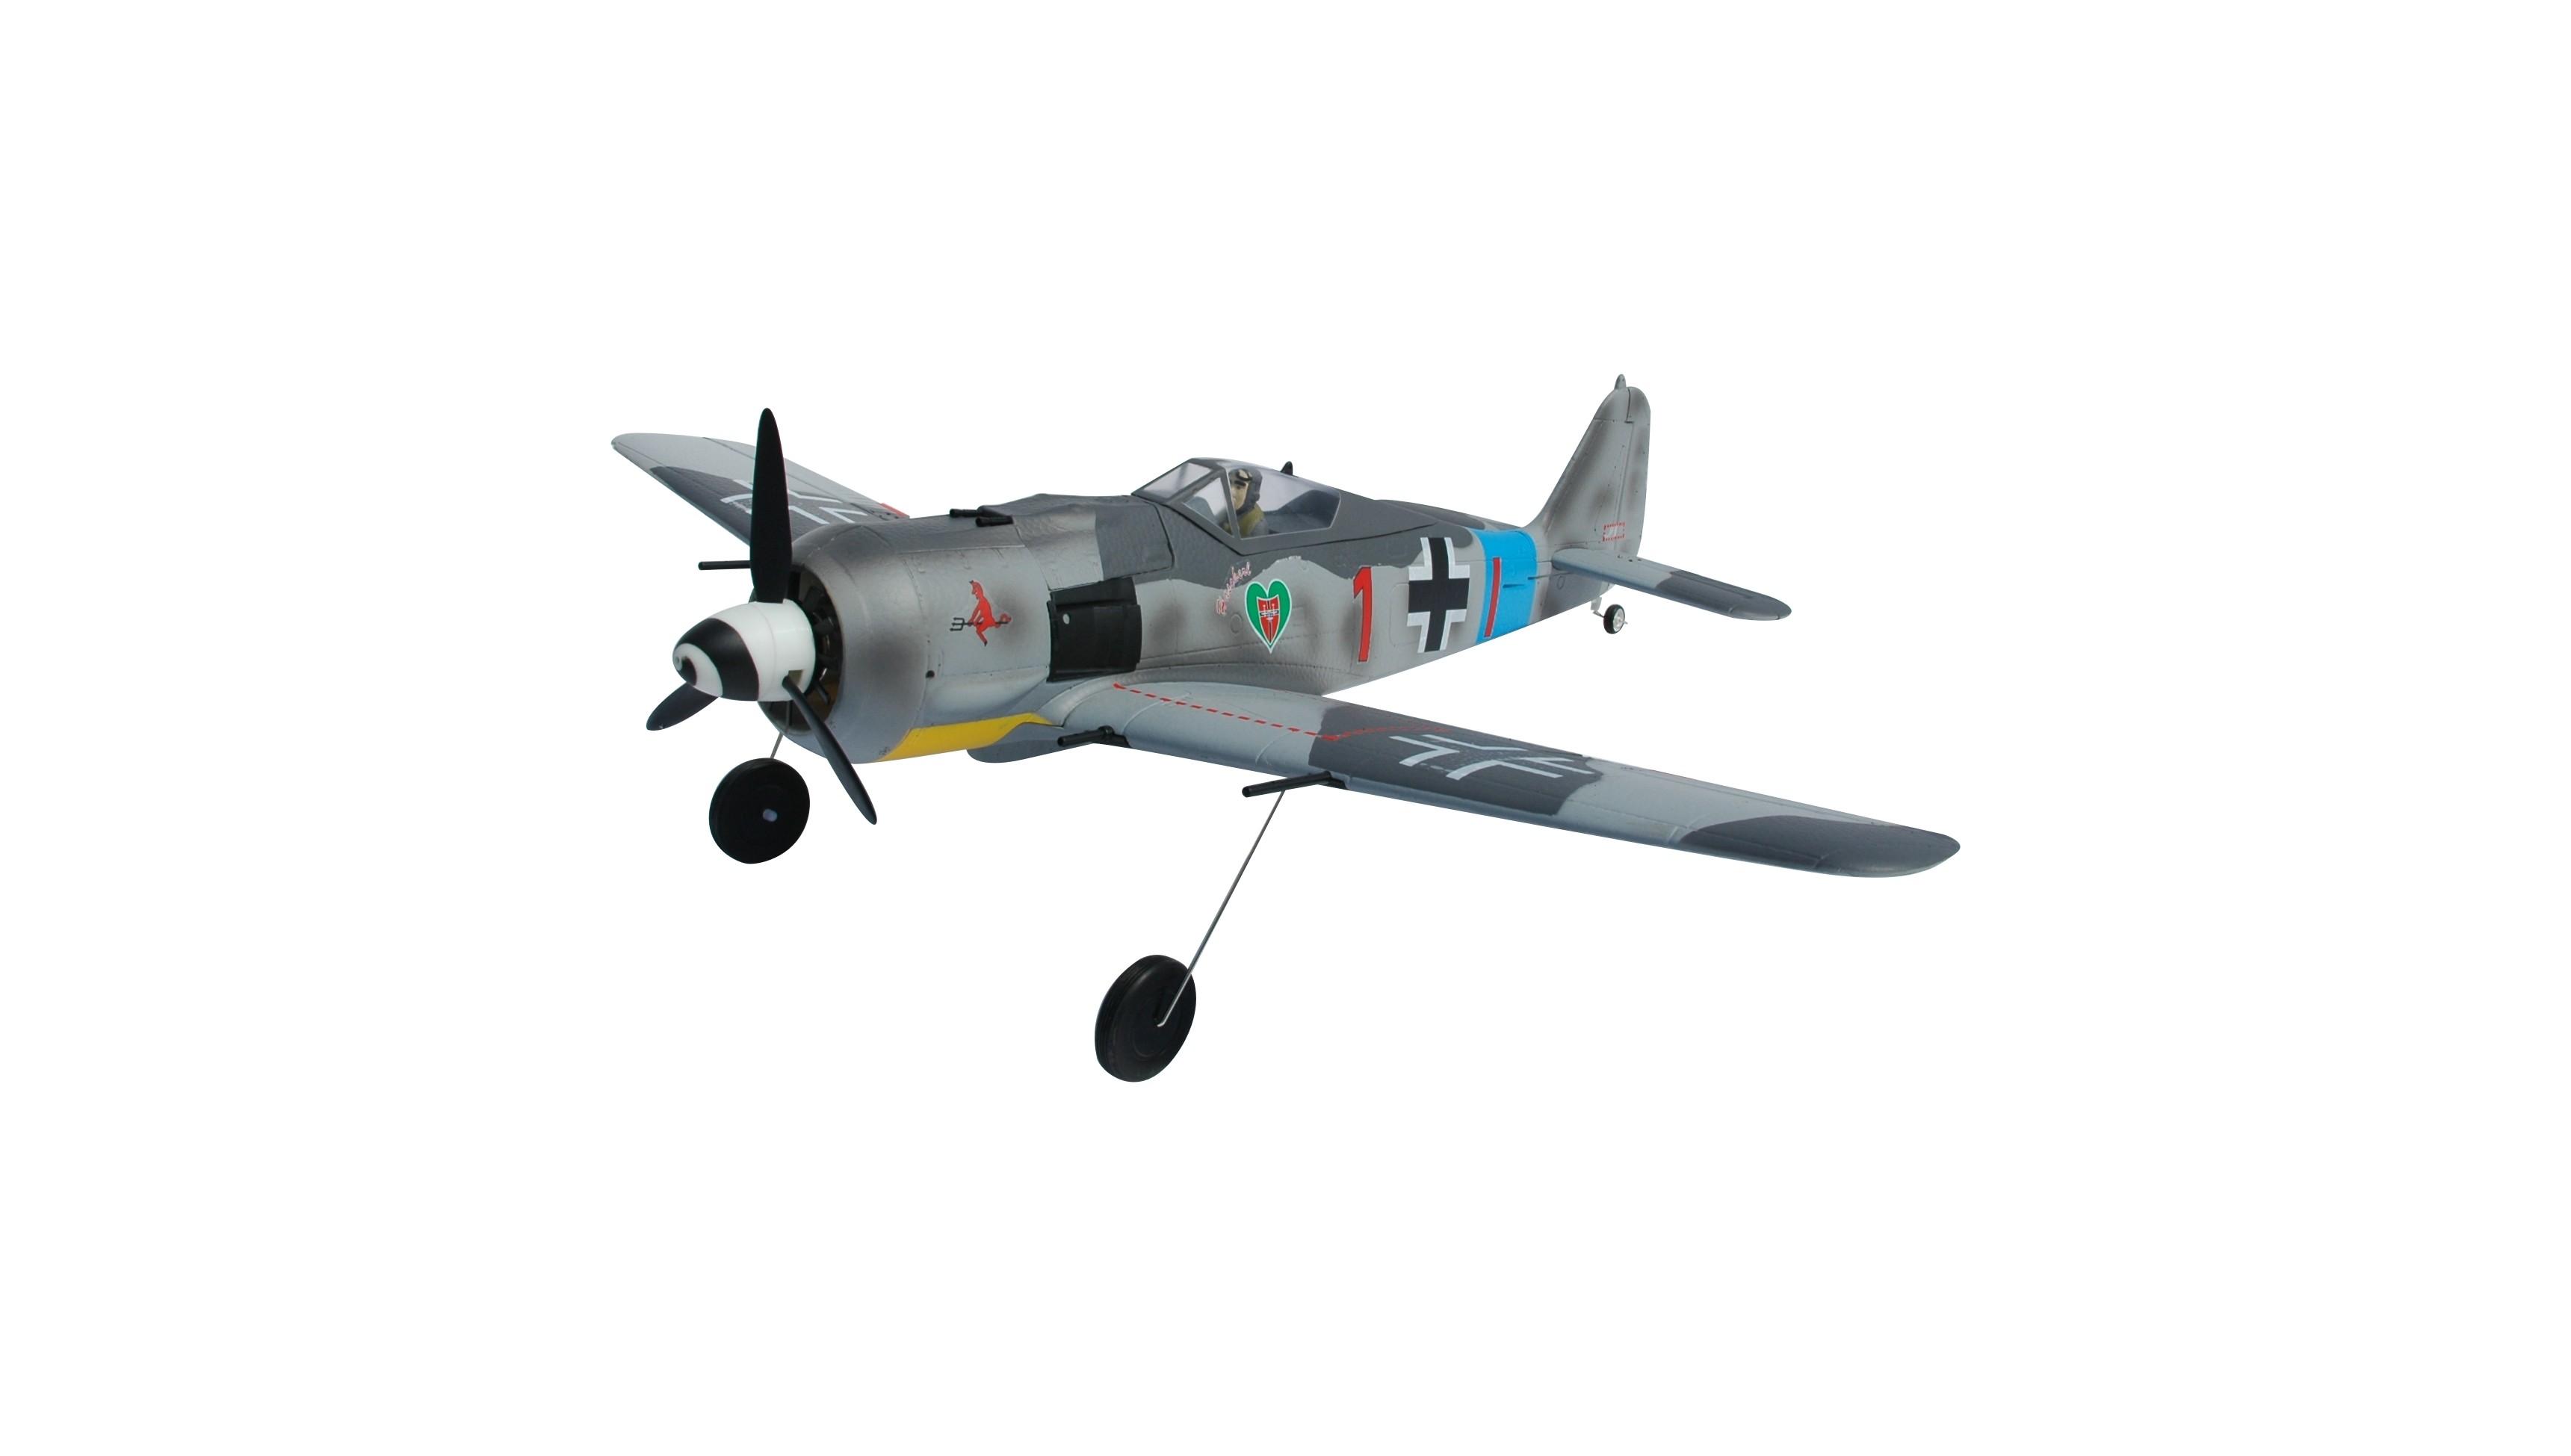 fw190 a8 camo 750mm mini warbird kit fms fms047c miniplanes. Black Bedroom Furniture Sets. Home Design Ideas